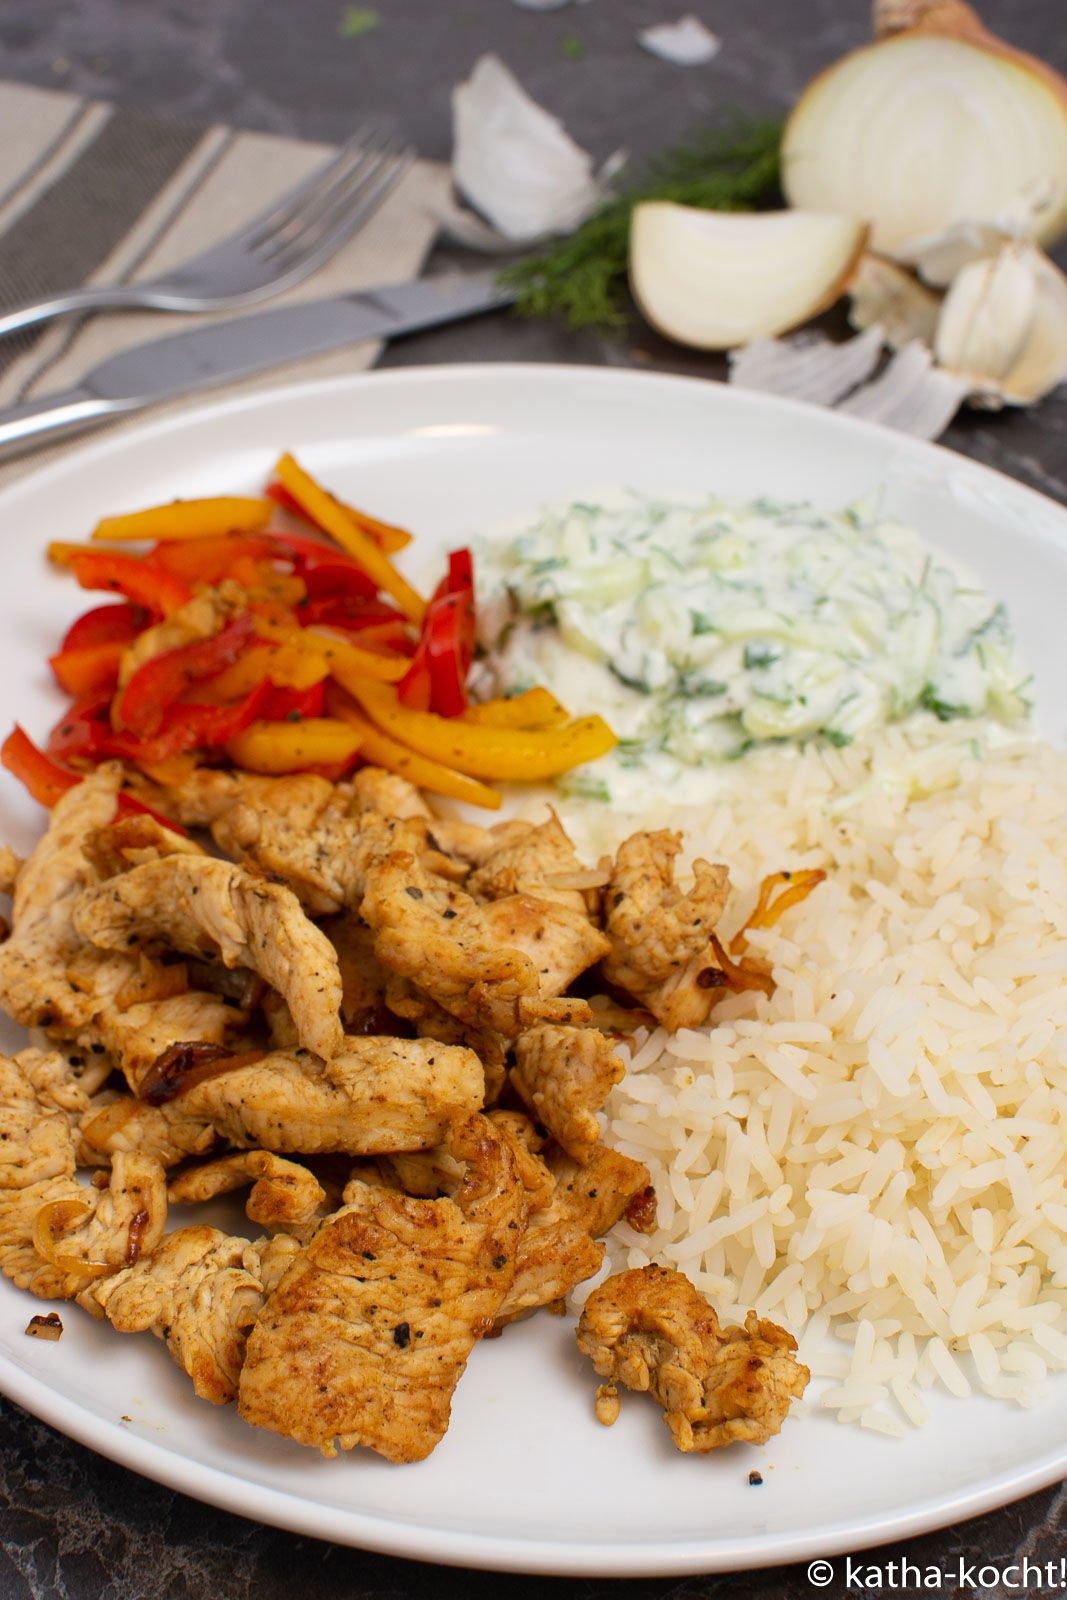 Putengyros mit Reis und Tsatziki - Katha-kocht! #healthyjuicerecipes